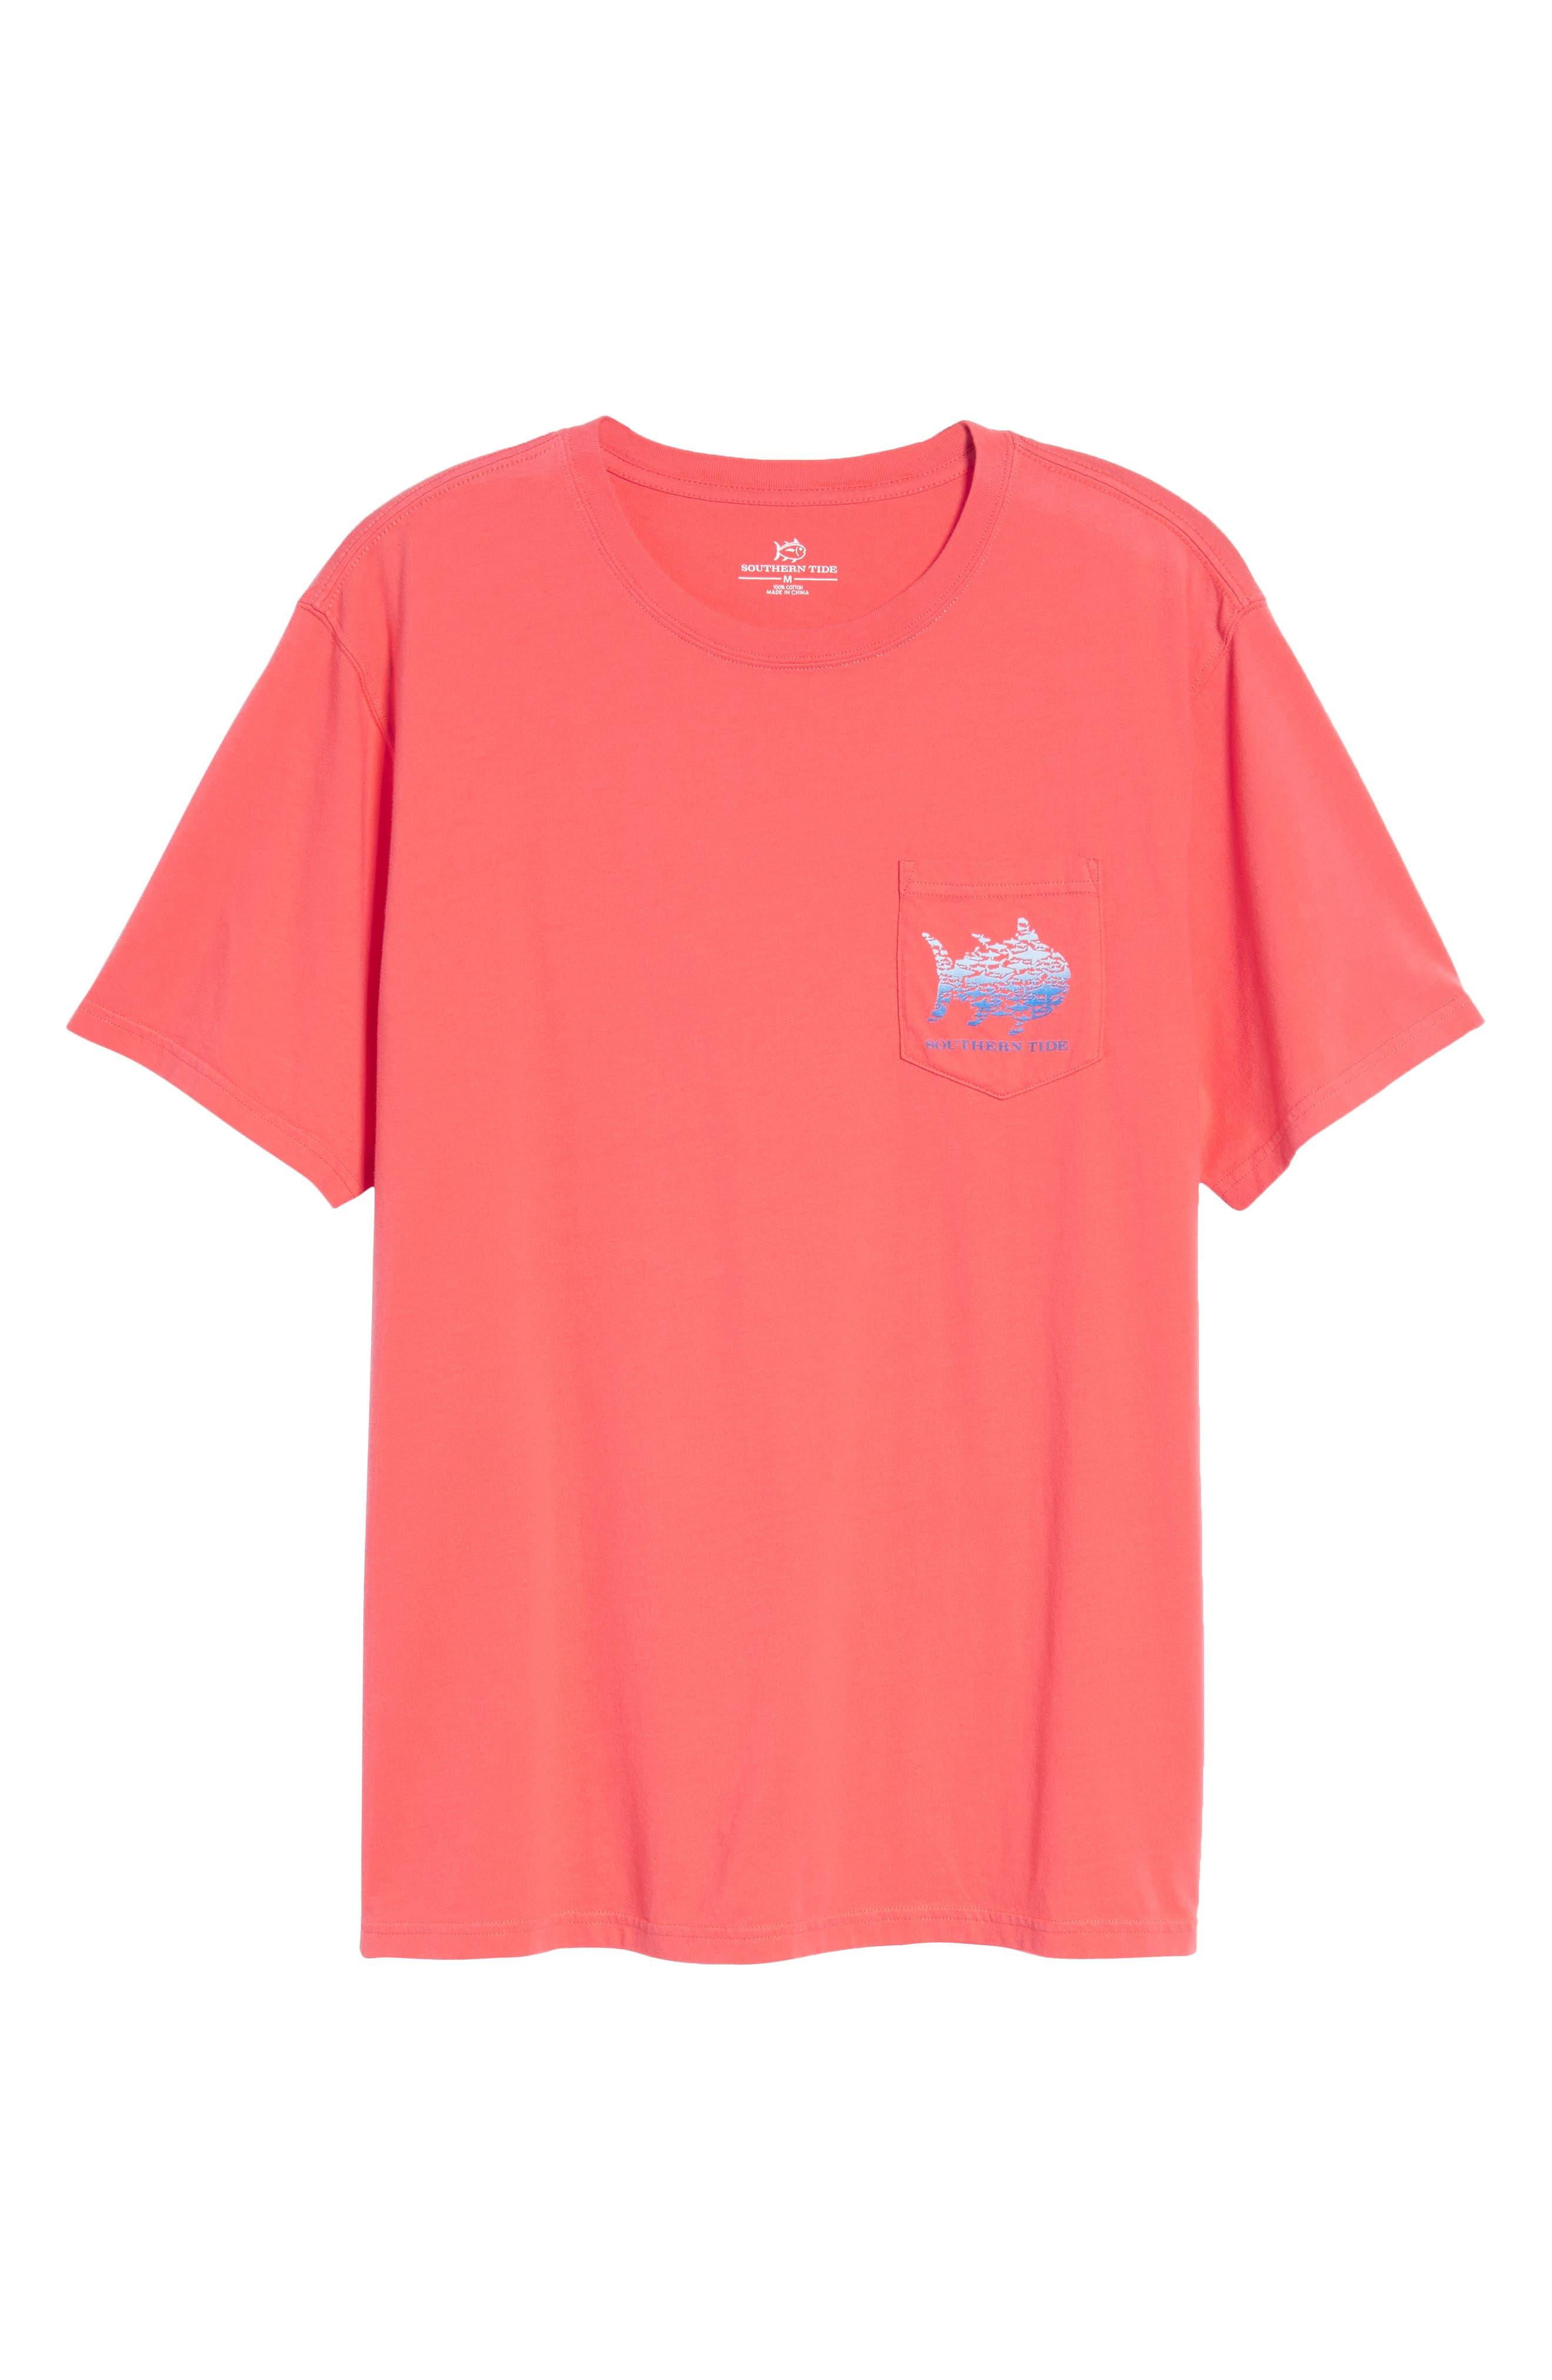 School Of Sharks Crewneck Cotton T-Shirt,                             Alternate thumbnail 6, color,                             682